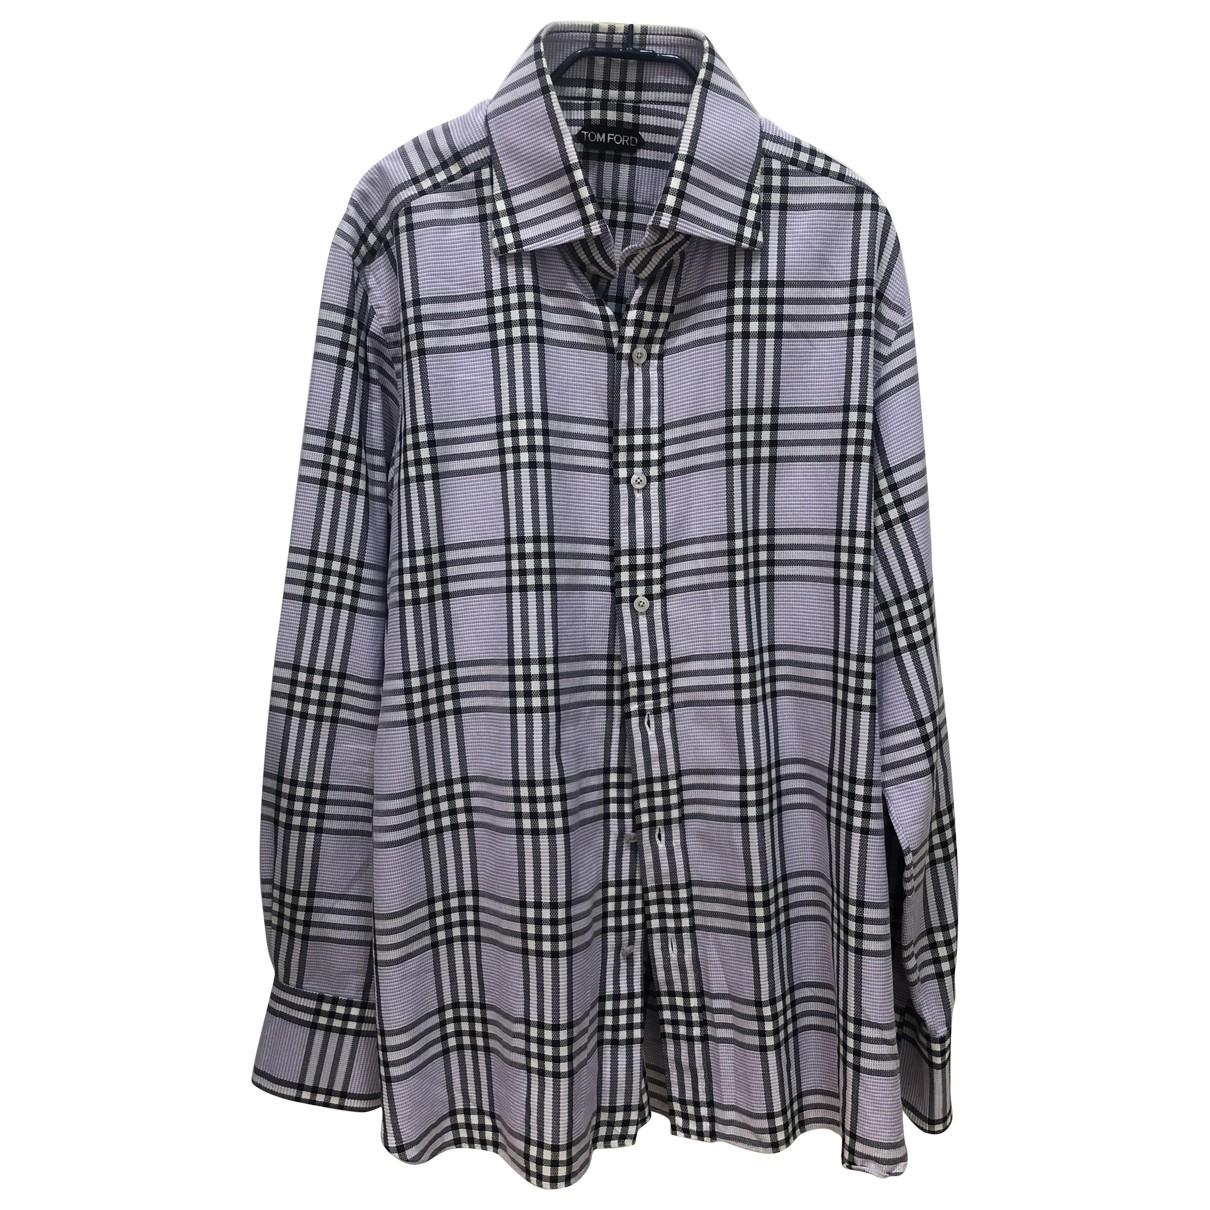 Tom Ford \N Grey Cotton Shirts for Men 17 UK - US (tour de cou / collar)